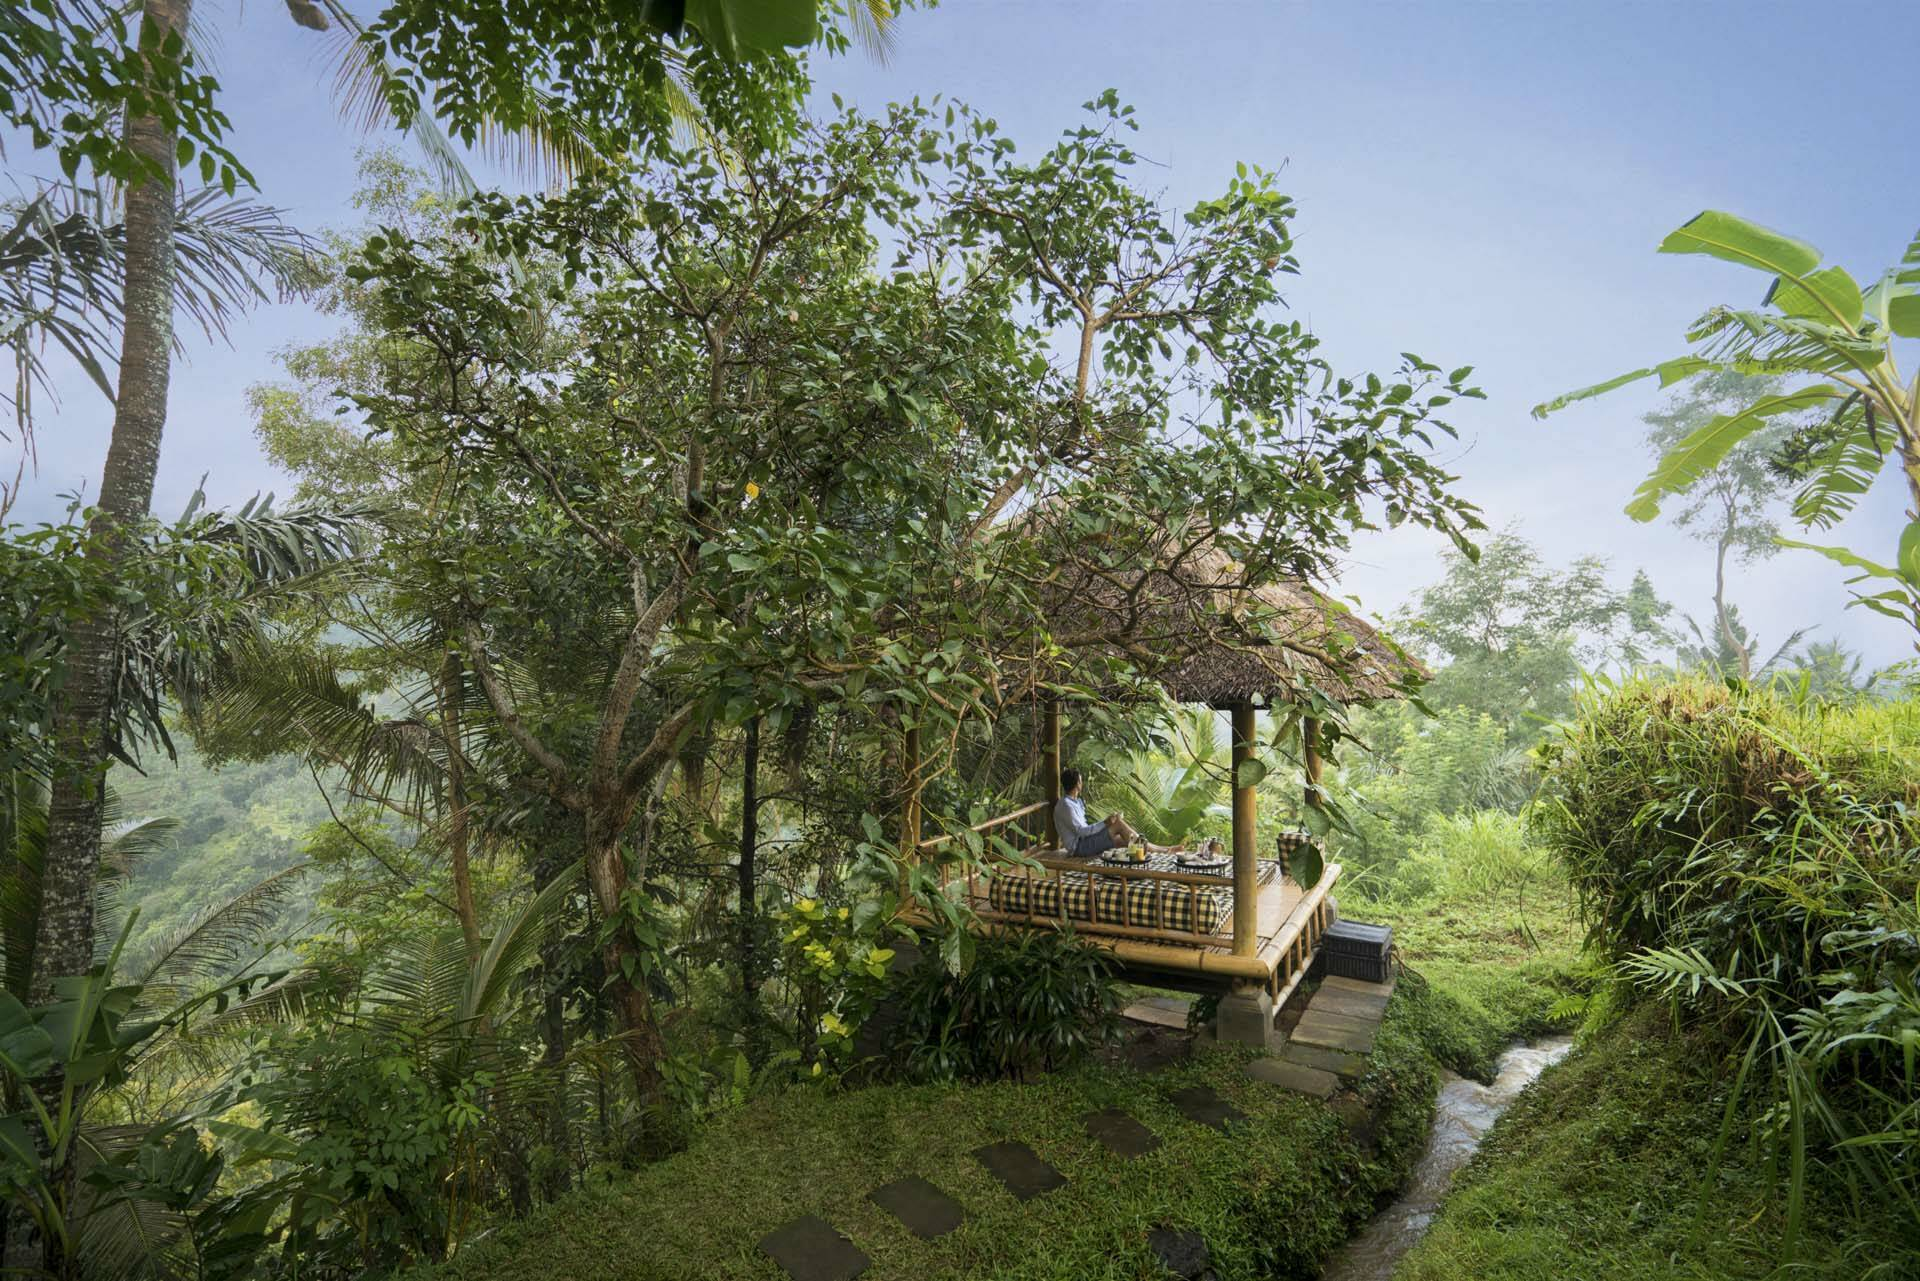 Amankila Tirta Sari Bale Manggis Bali